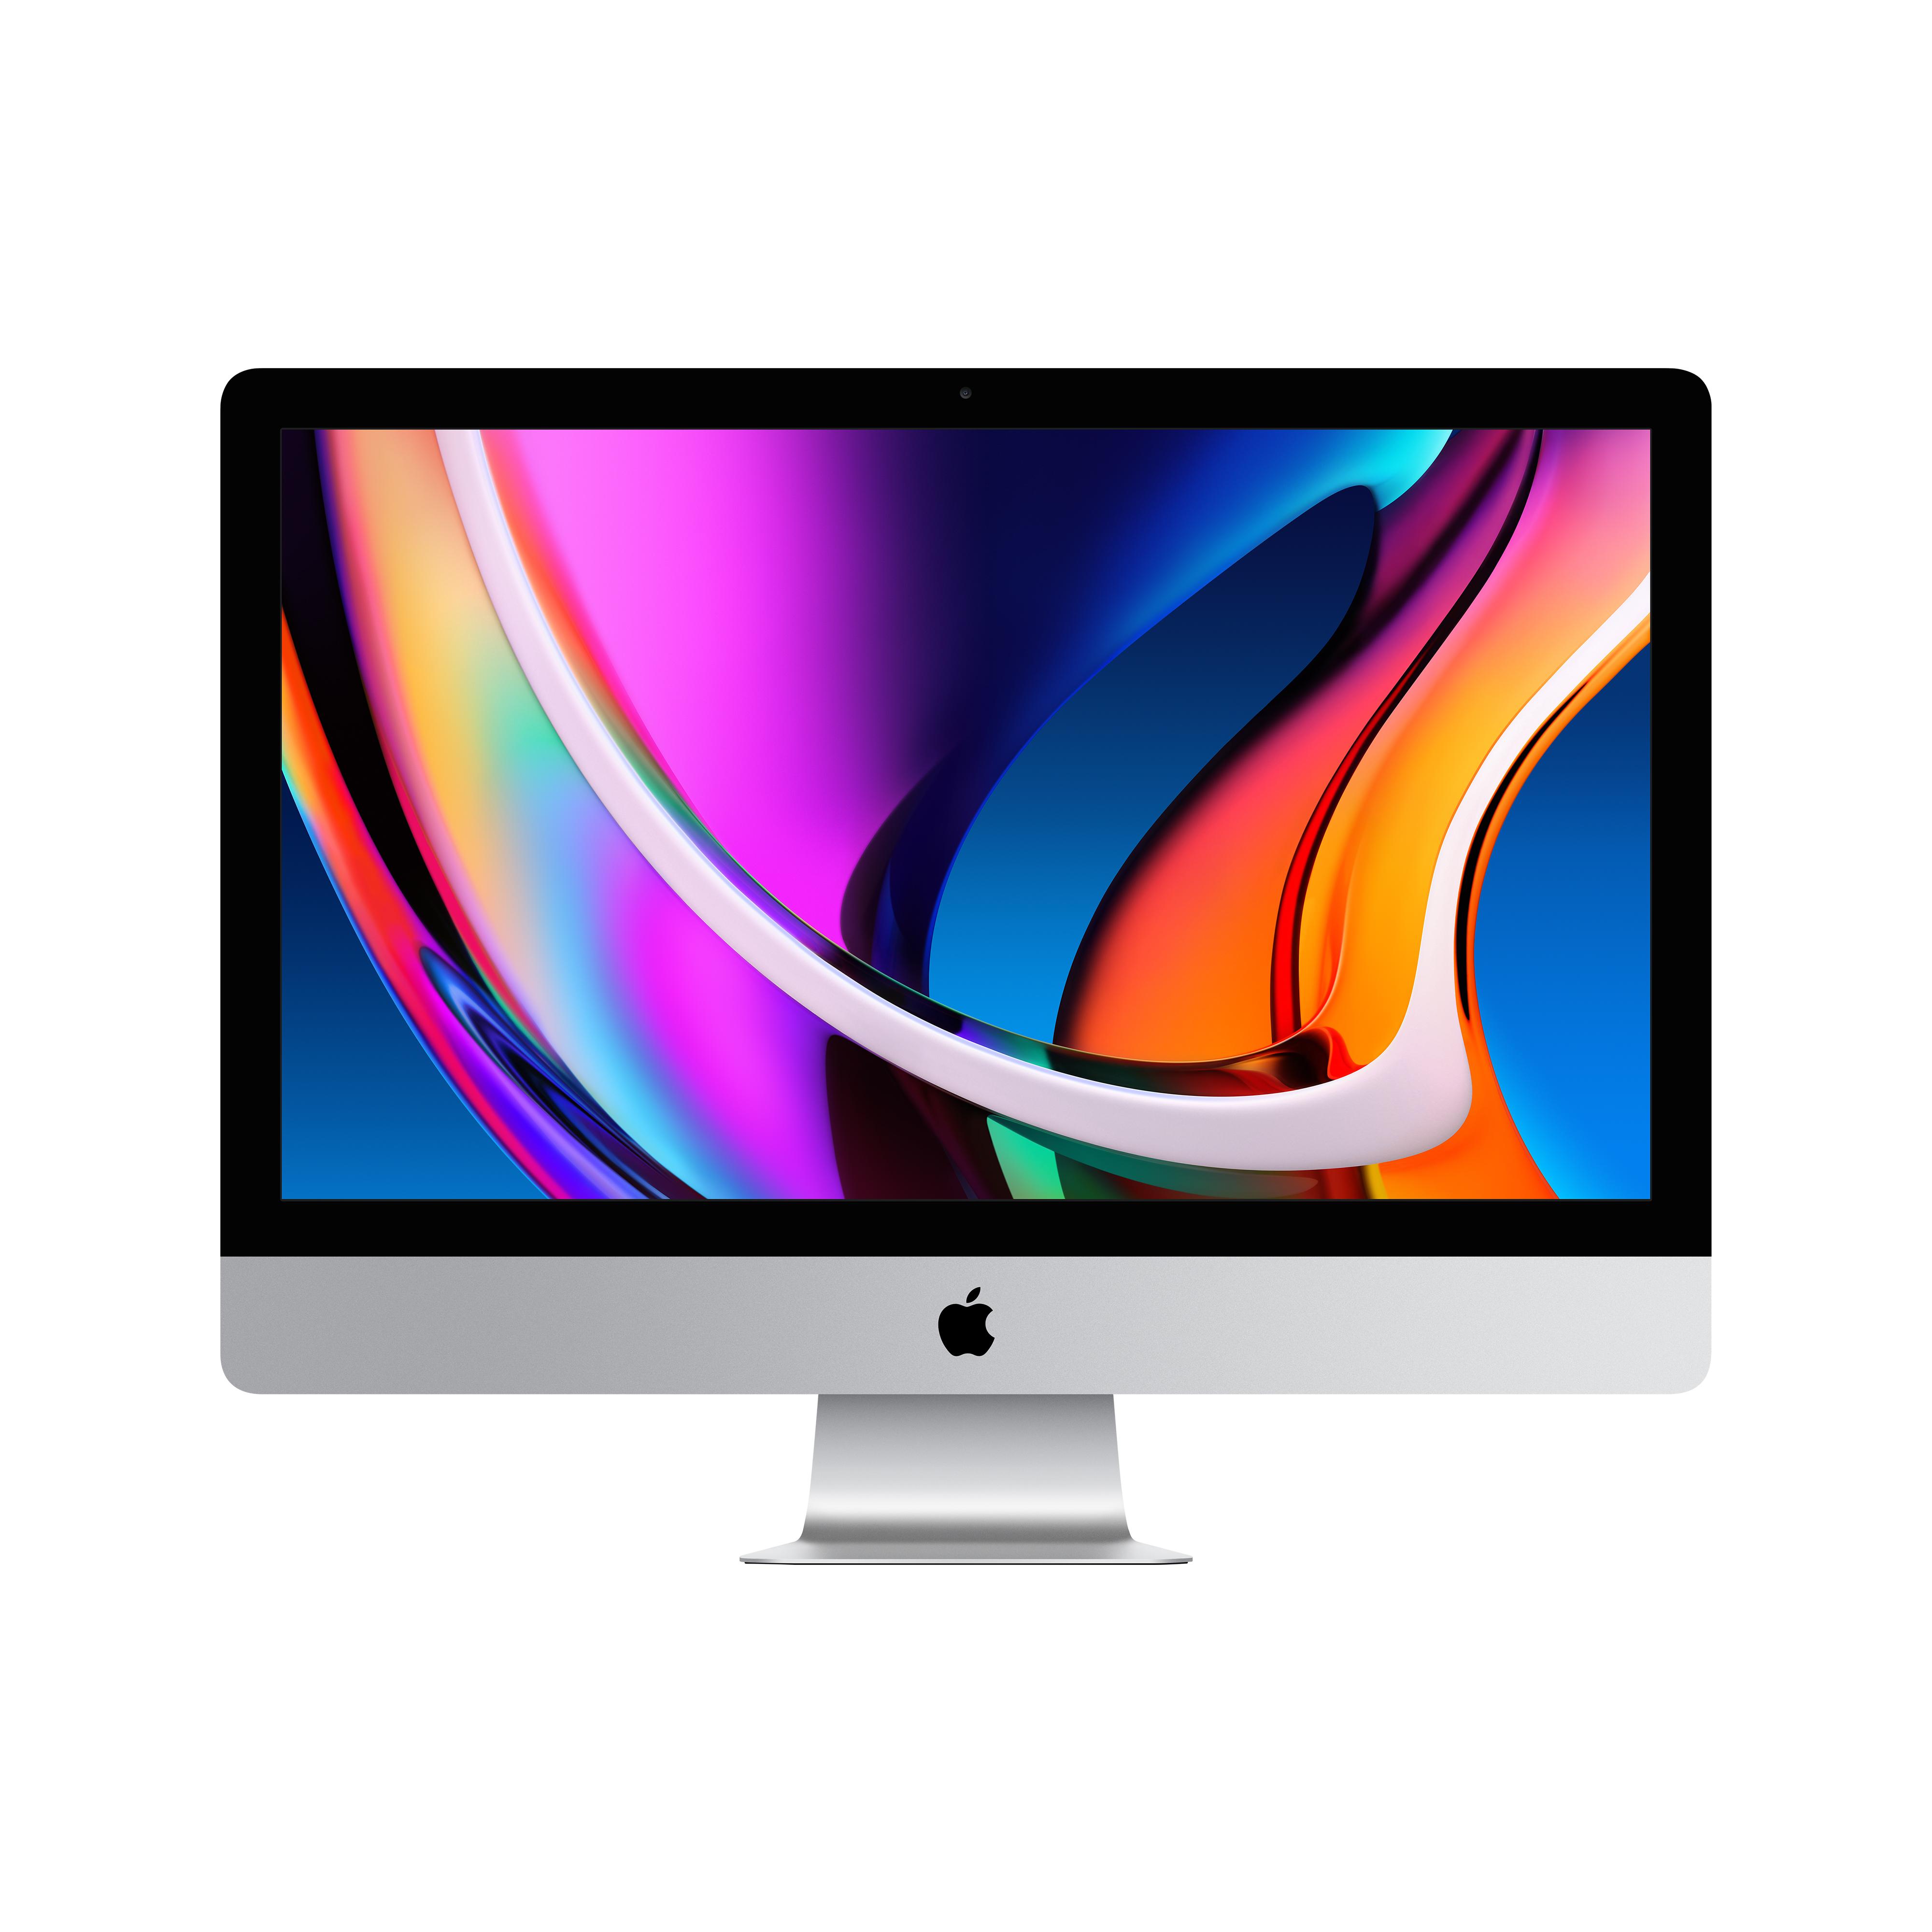 Apple 2020년 아이맥 27, 10세대 i7, 8GB, SSD 1TB, AMD Radeon Pro 5700XT 16GB, Gigabit Ethernet, Retina 5K